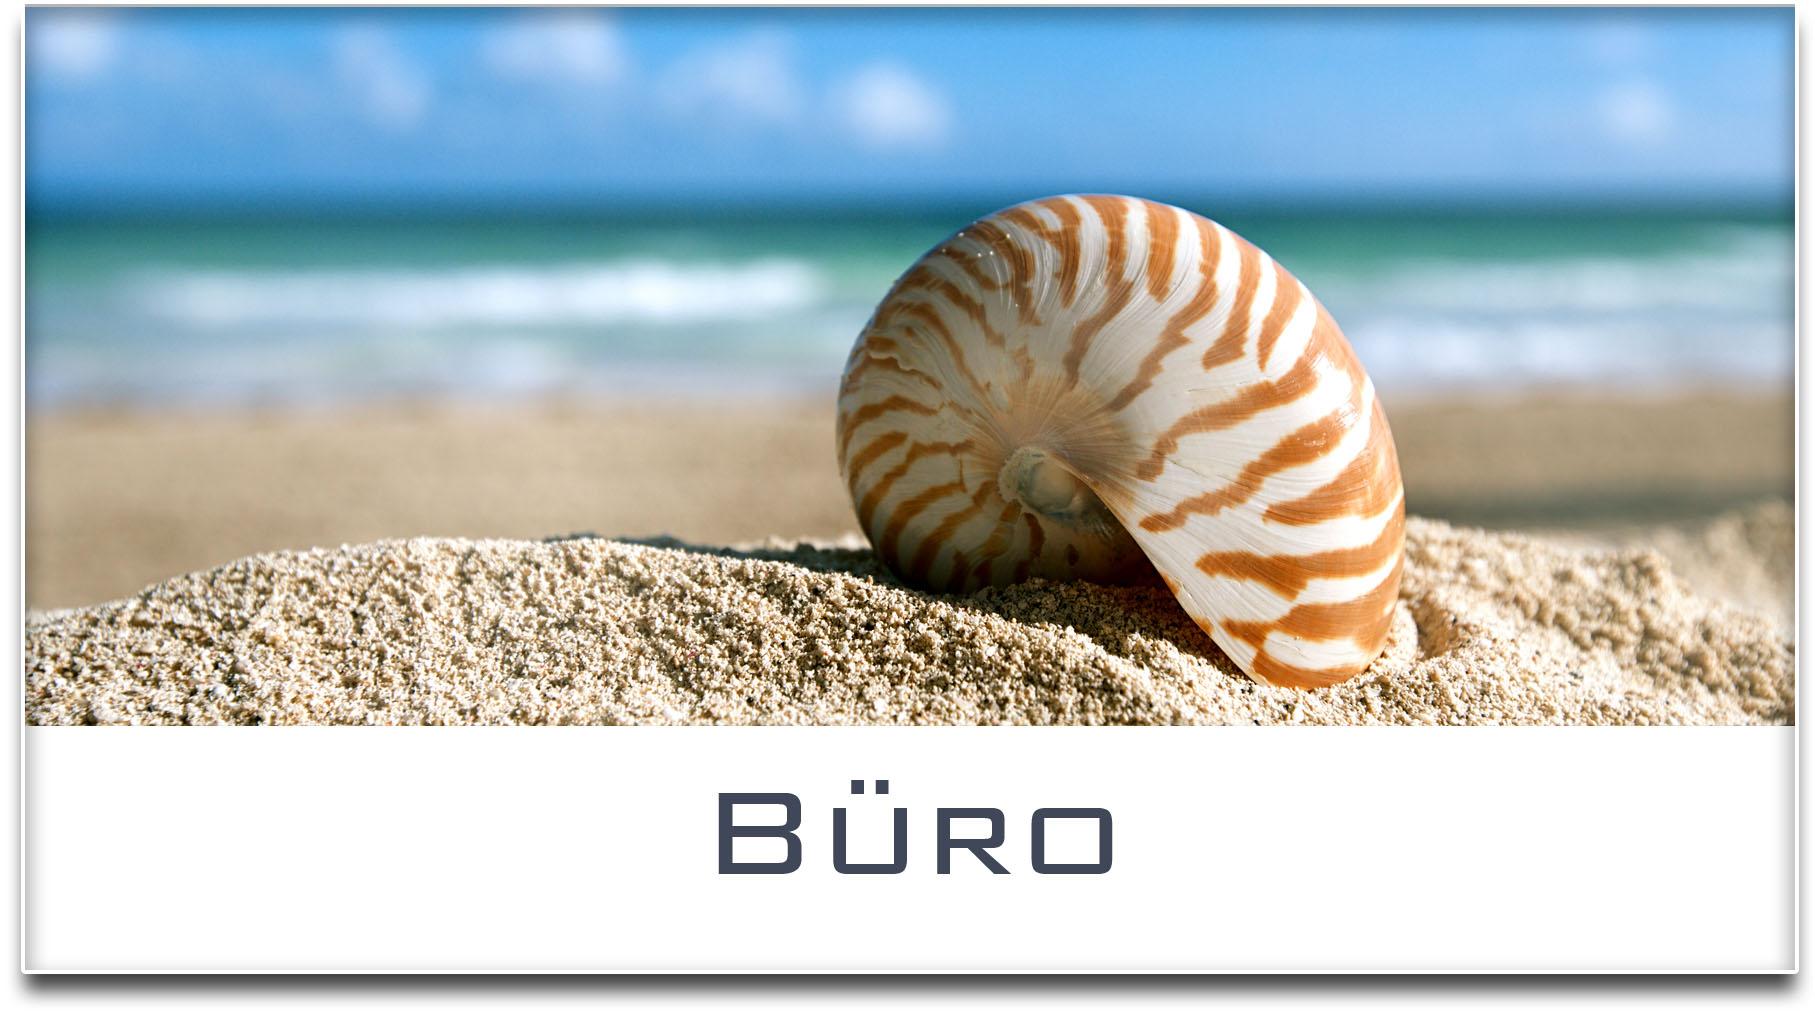 Türschild / Haustürschild / Muschel / Strand / Büro / Selbstklebend